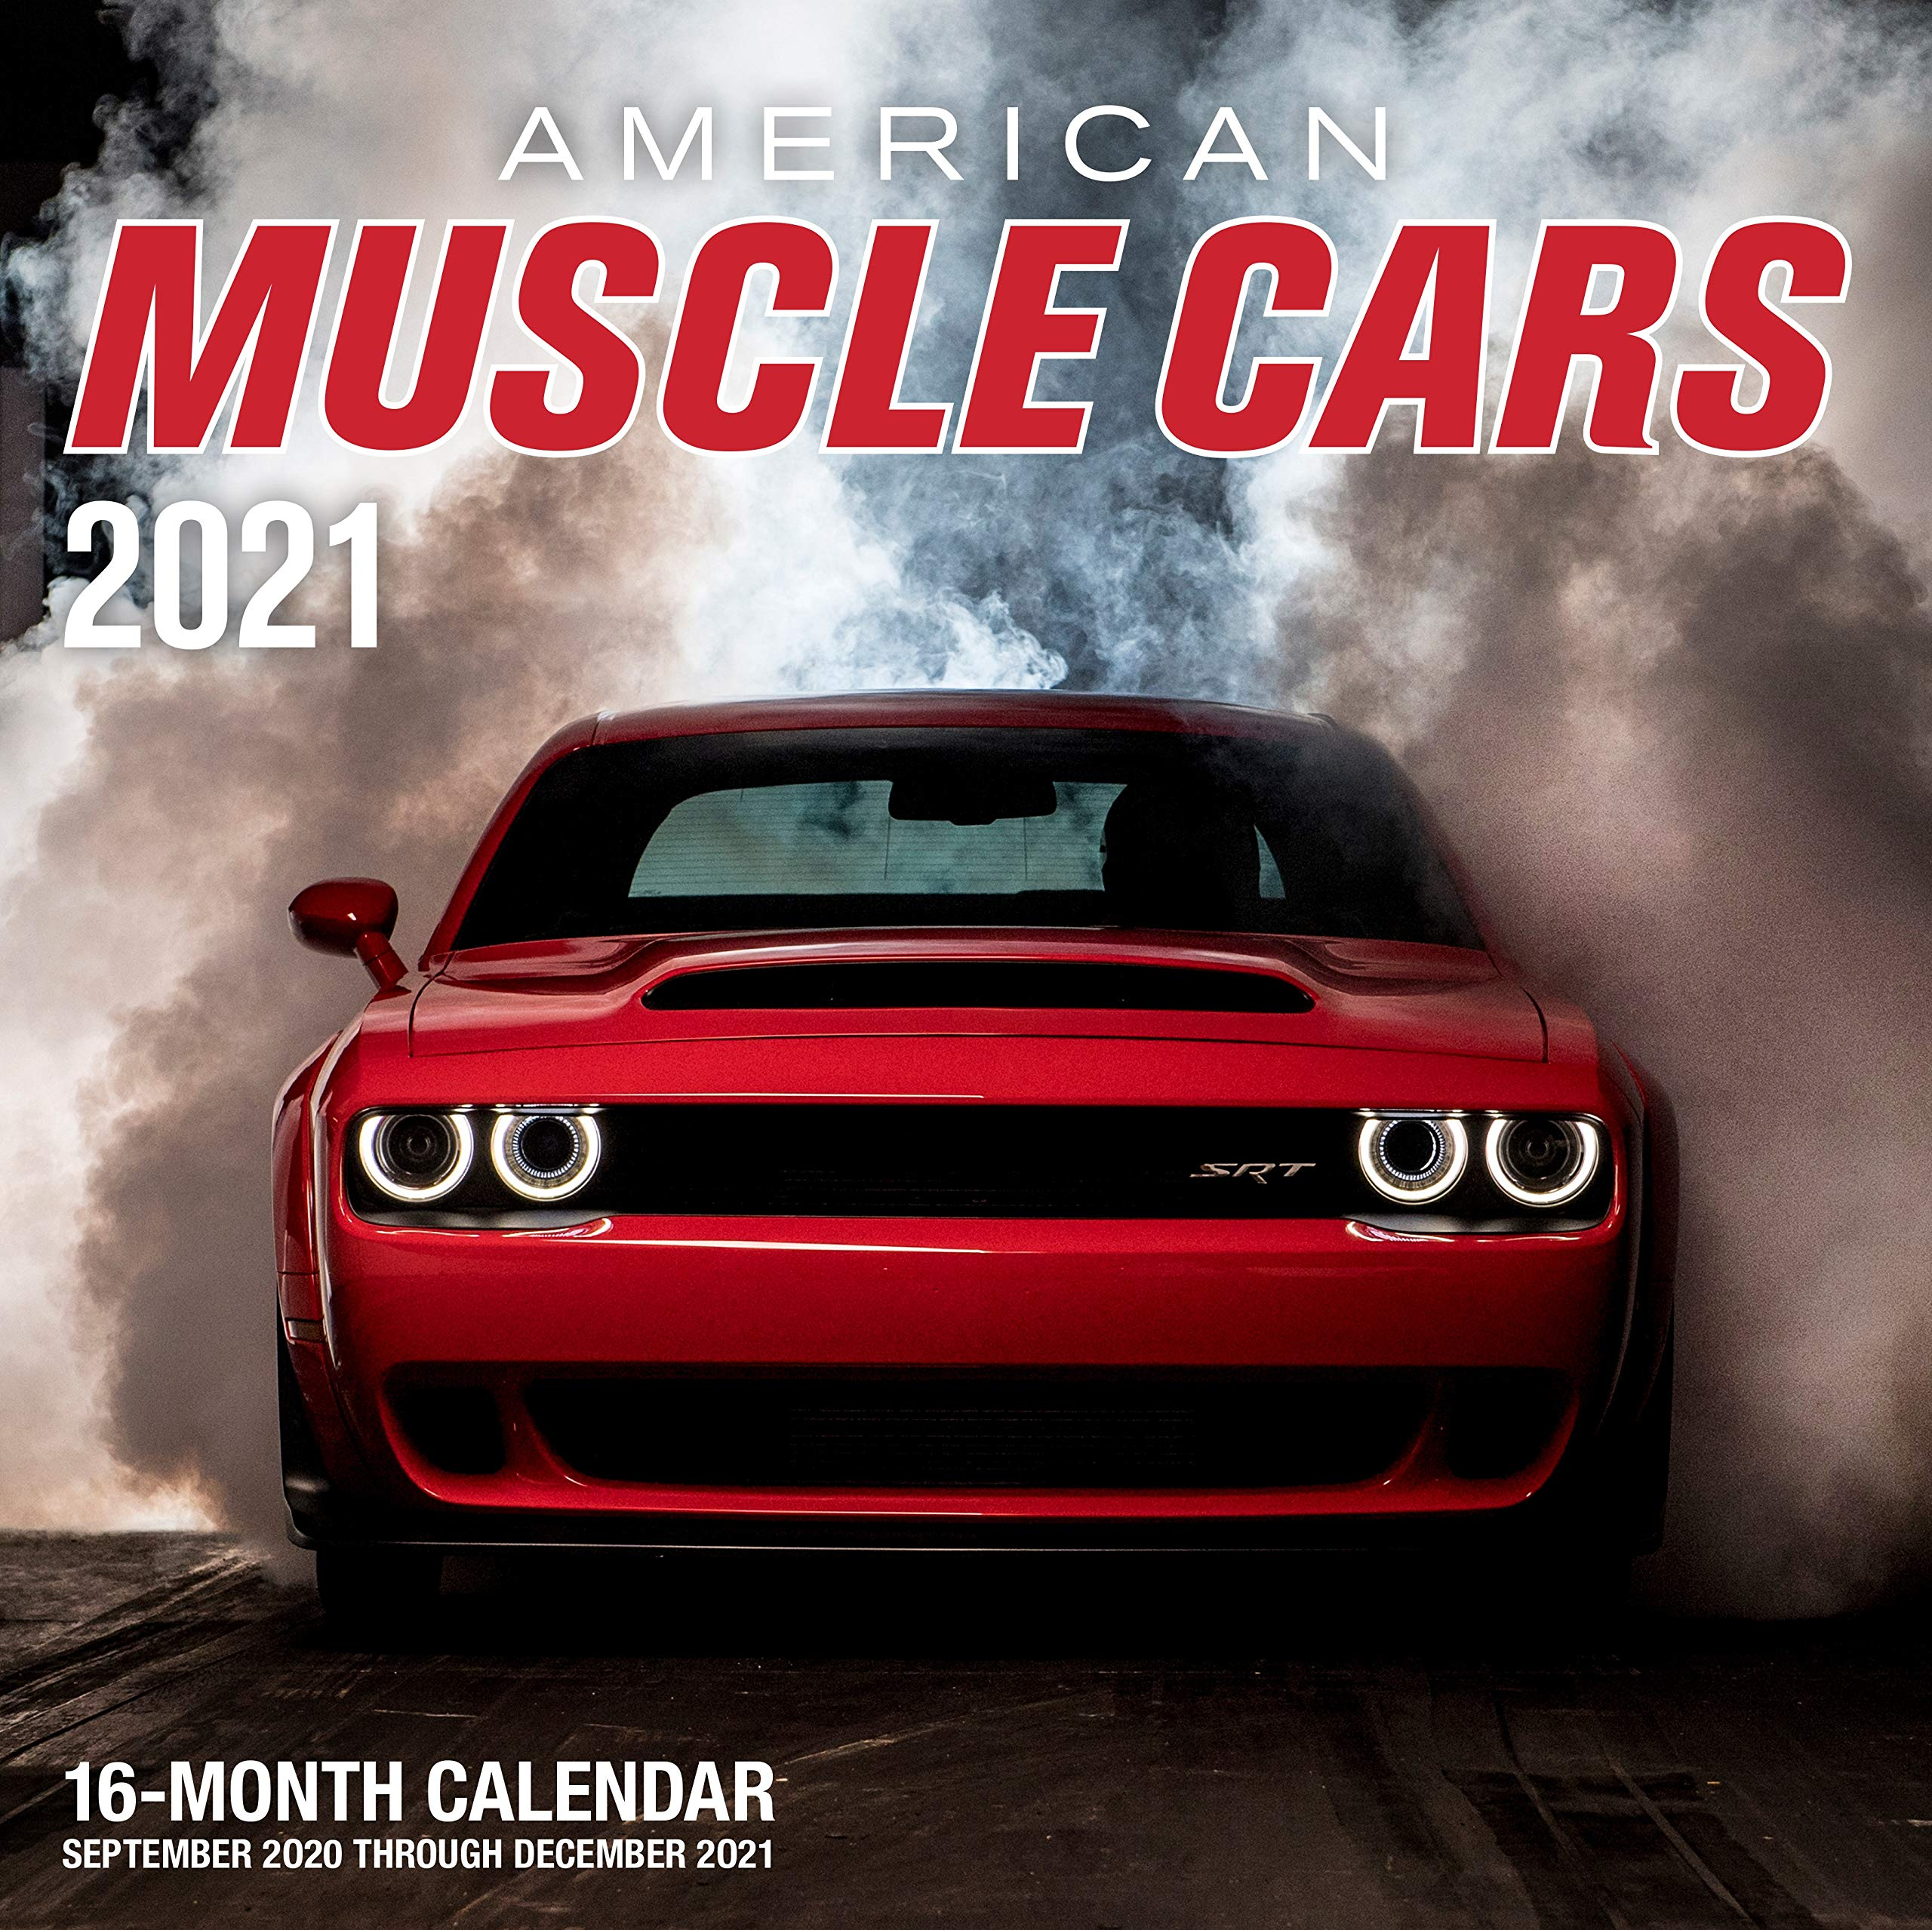 American Muscle Cars 2021: 16 Month Calendar   September 2020